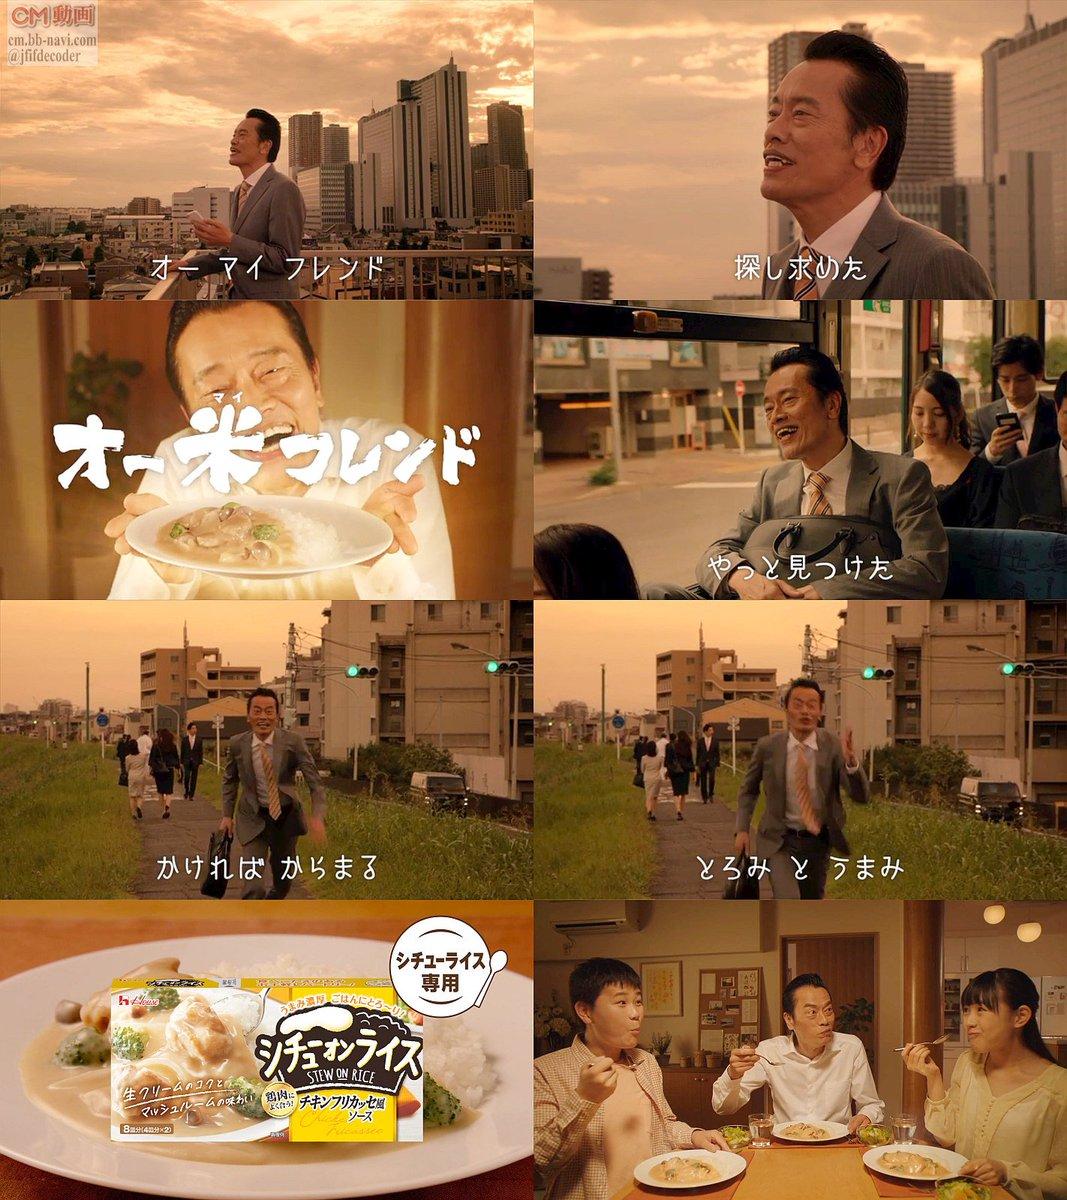 Cm 俳優 ピザーラ ピザーラ(2020)CM俳優は誰?【おいしそうにピザを頬張るのは成田凌】